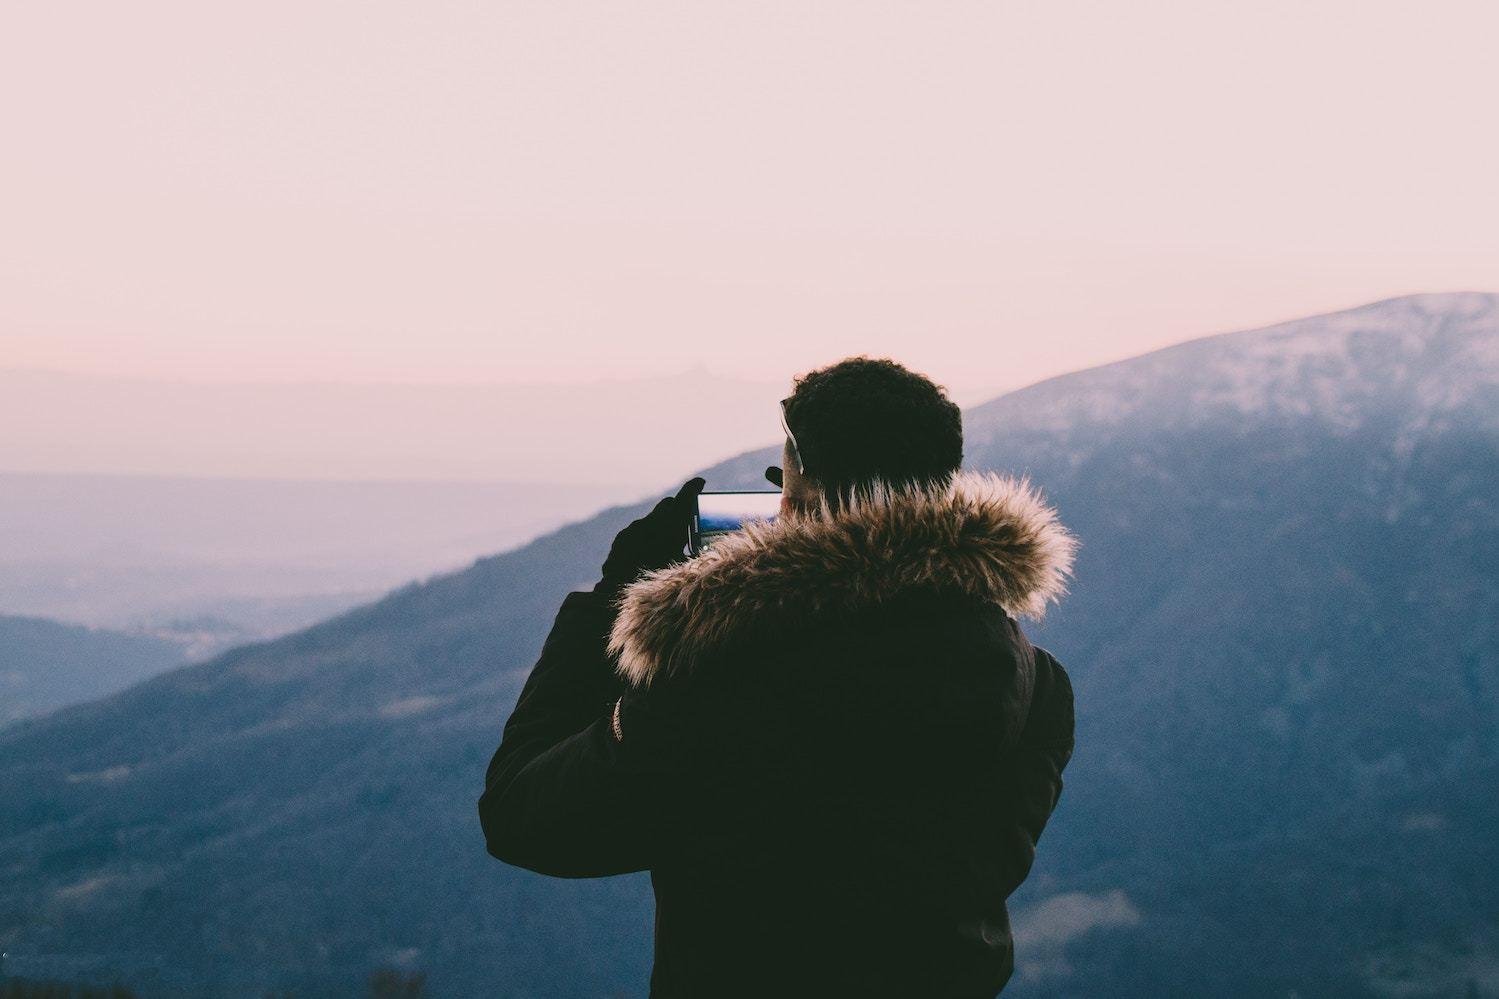 A man takes a photo from atop a mountain